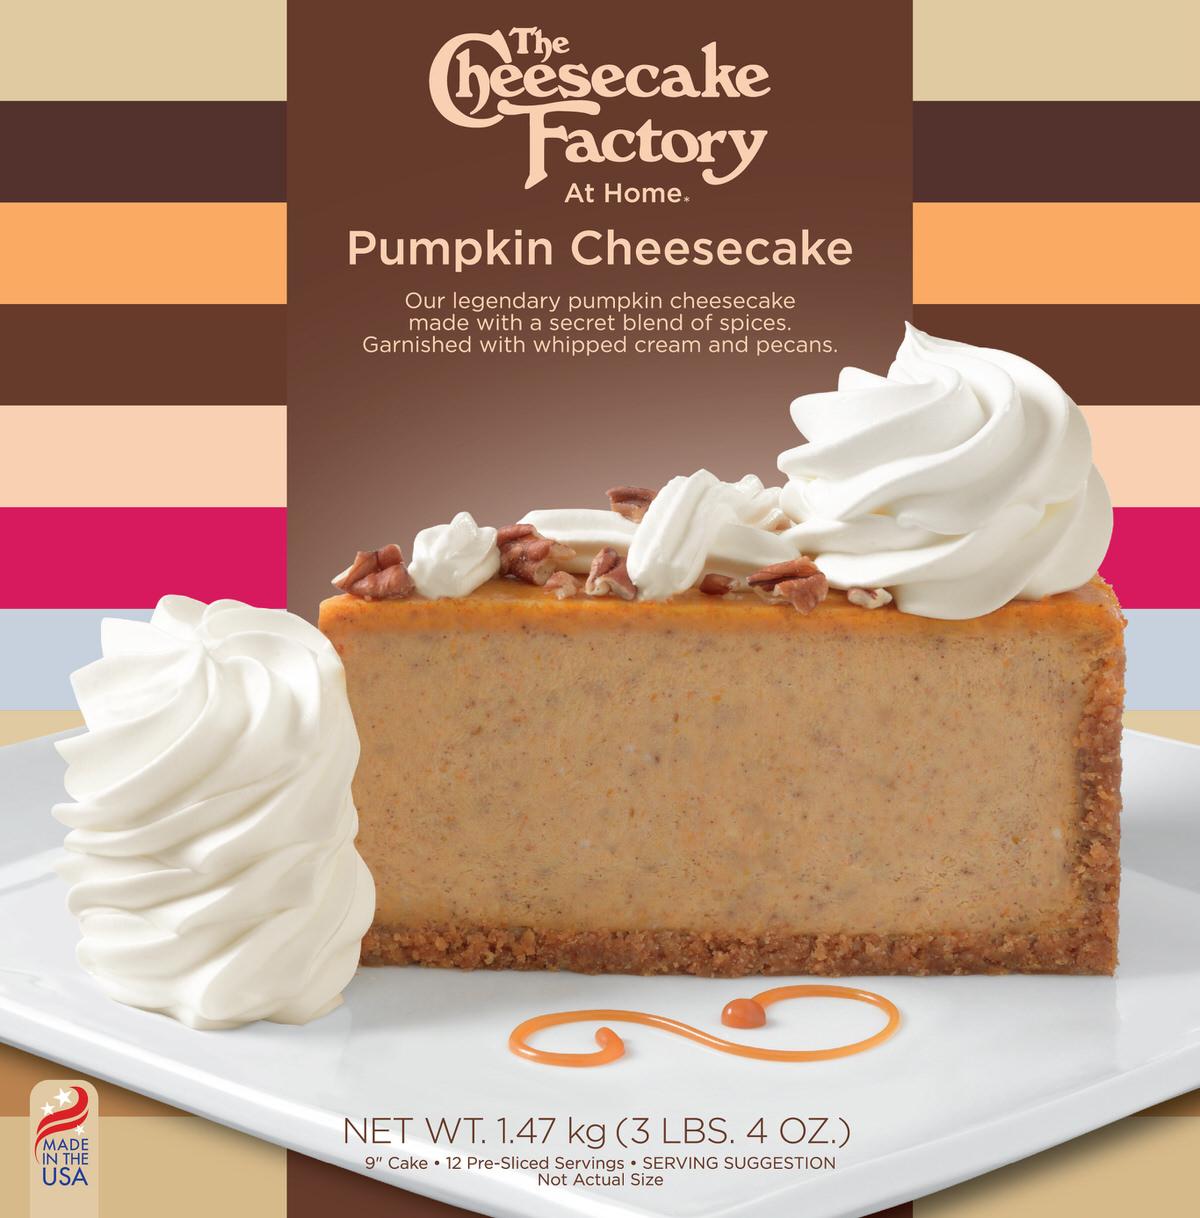 9 inch Pumpkin Cheesecake